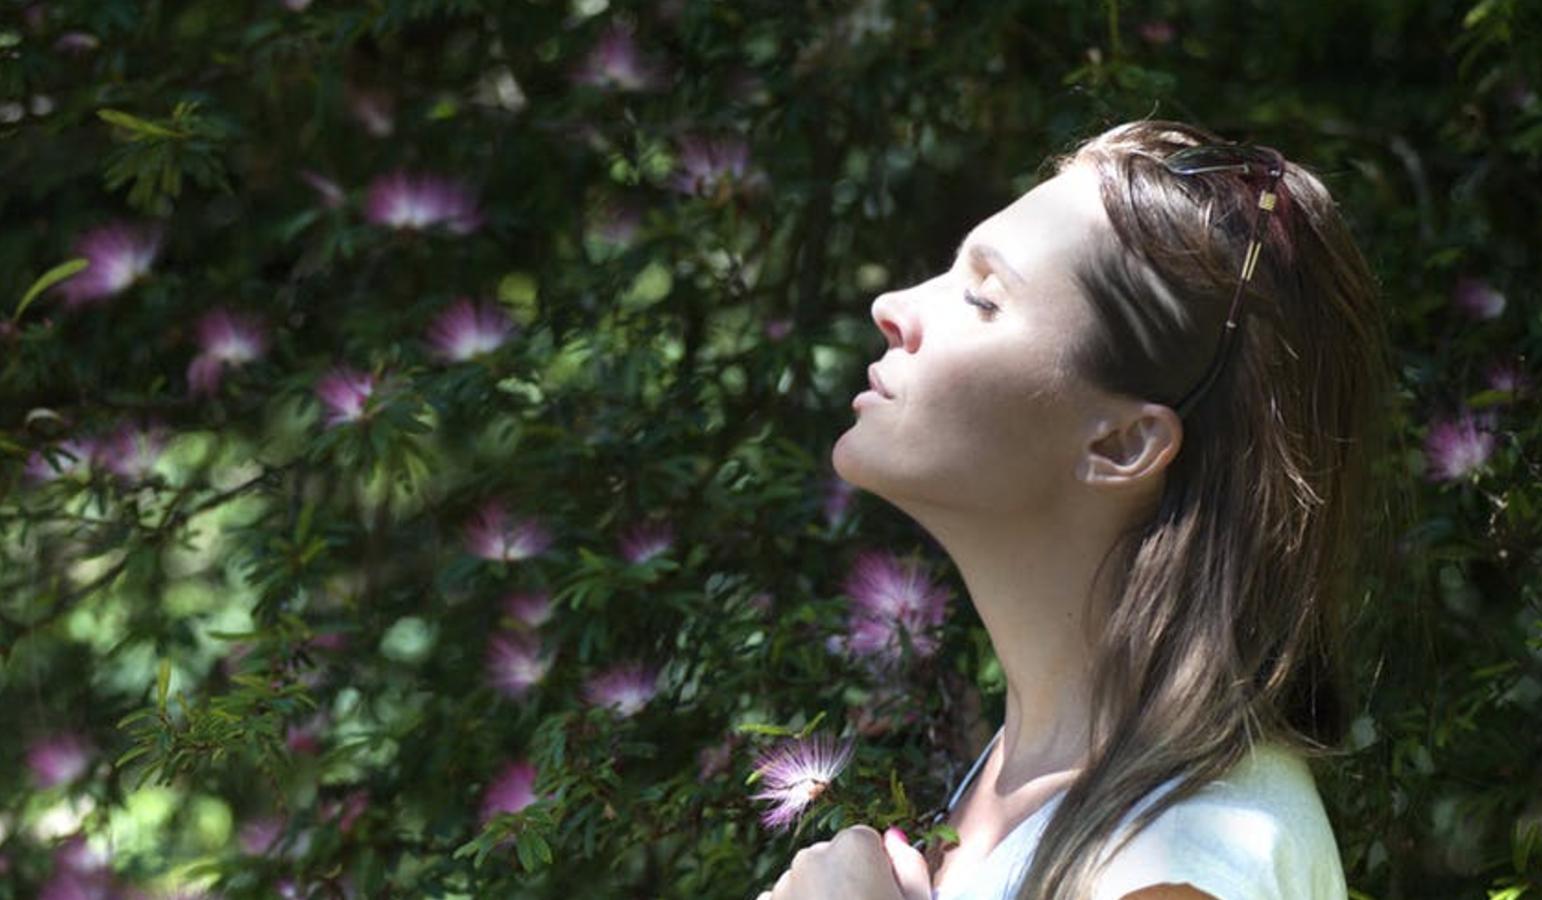 Naturopathic Beauty's Top Ten Naturopathic Beauty Tips